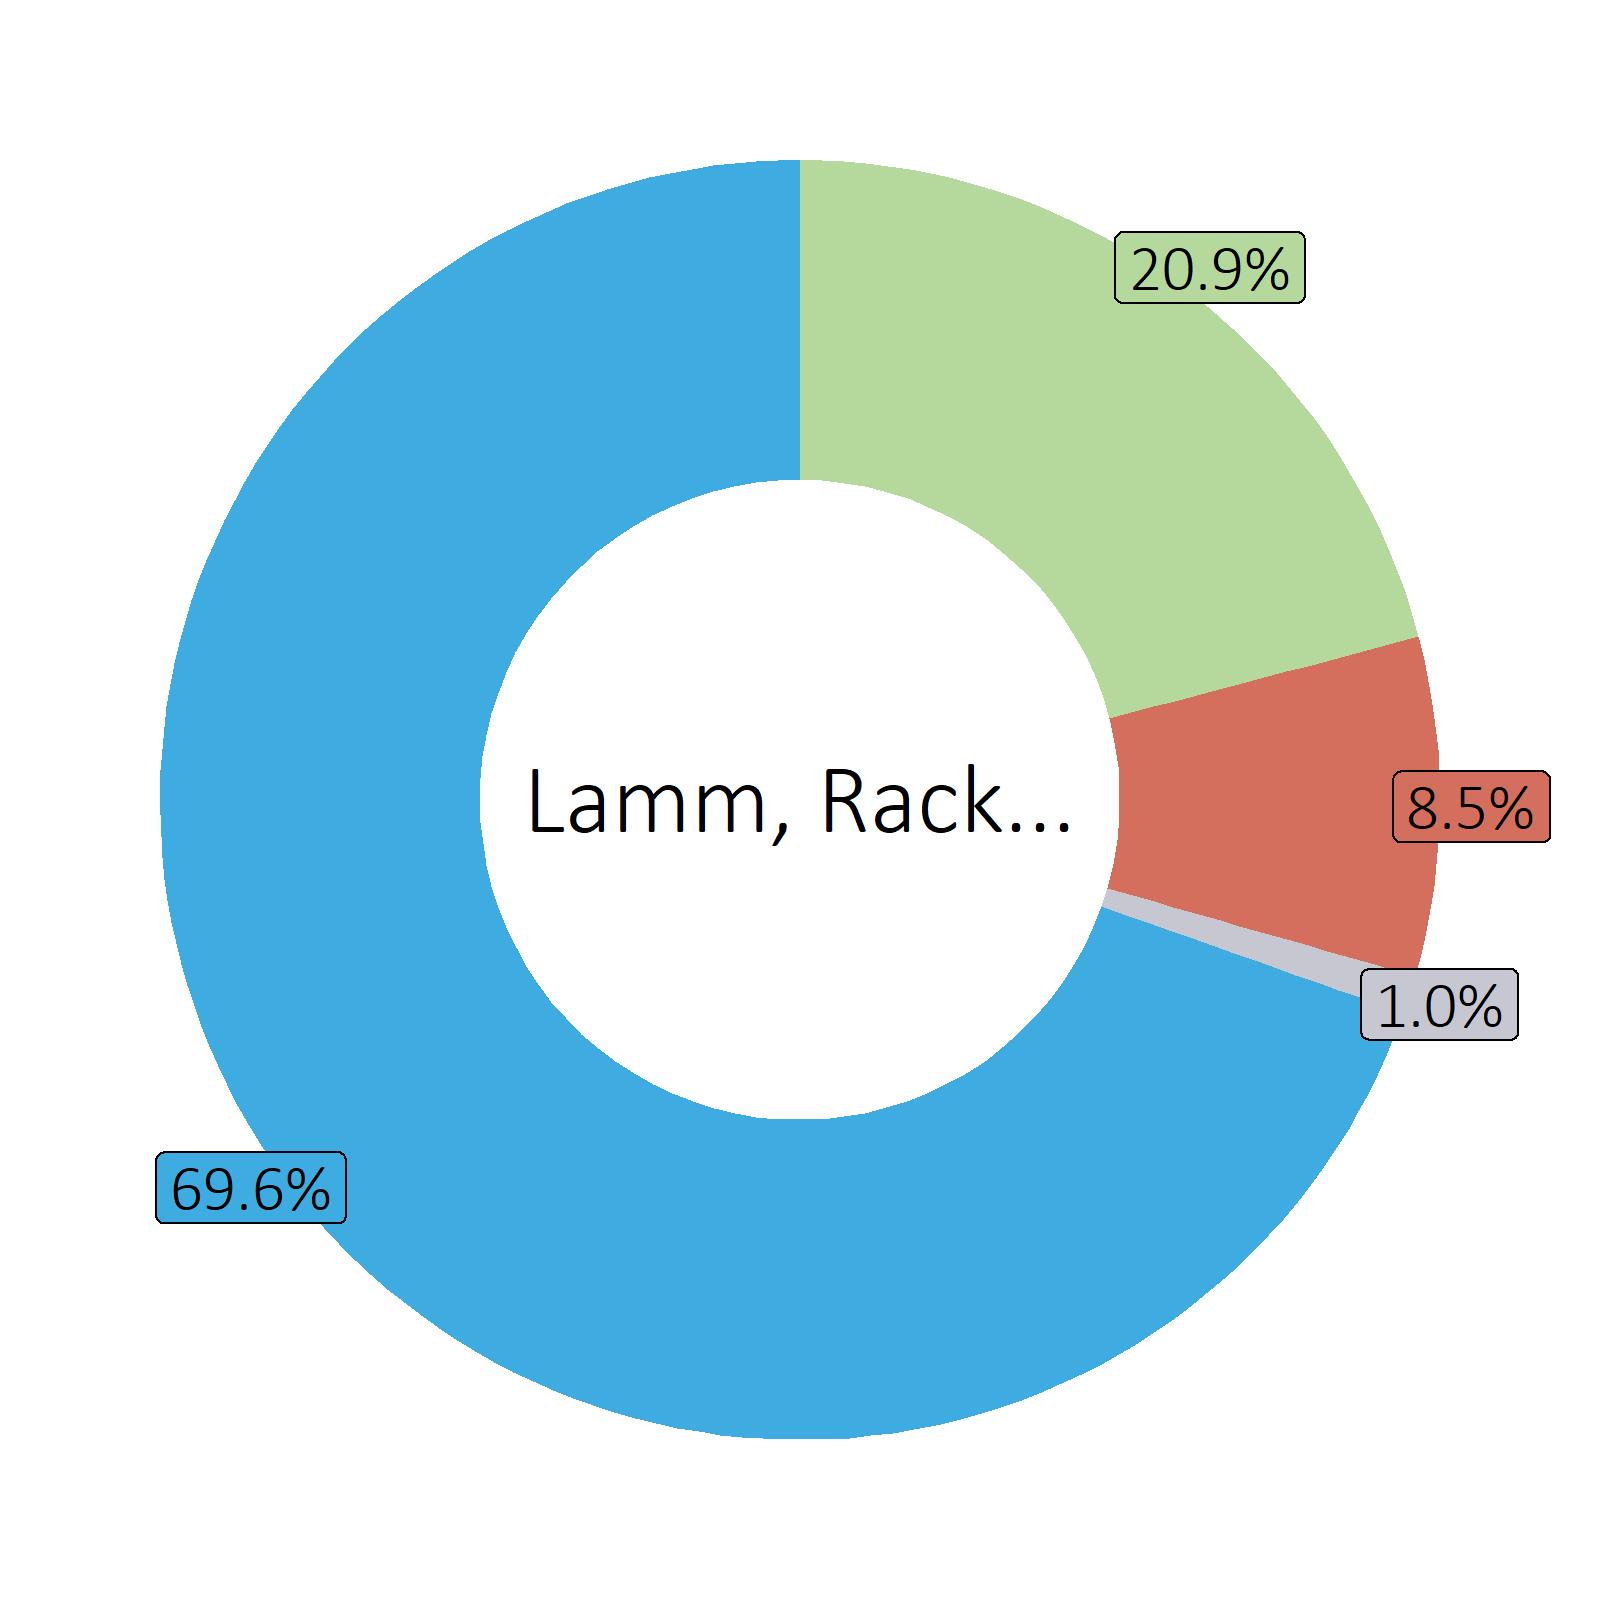 Bestandteile Lamm, Racks (Australien, Neuseeland)